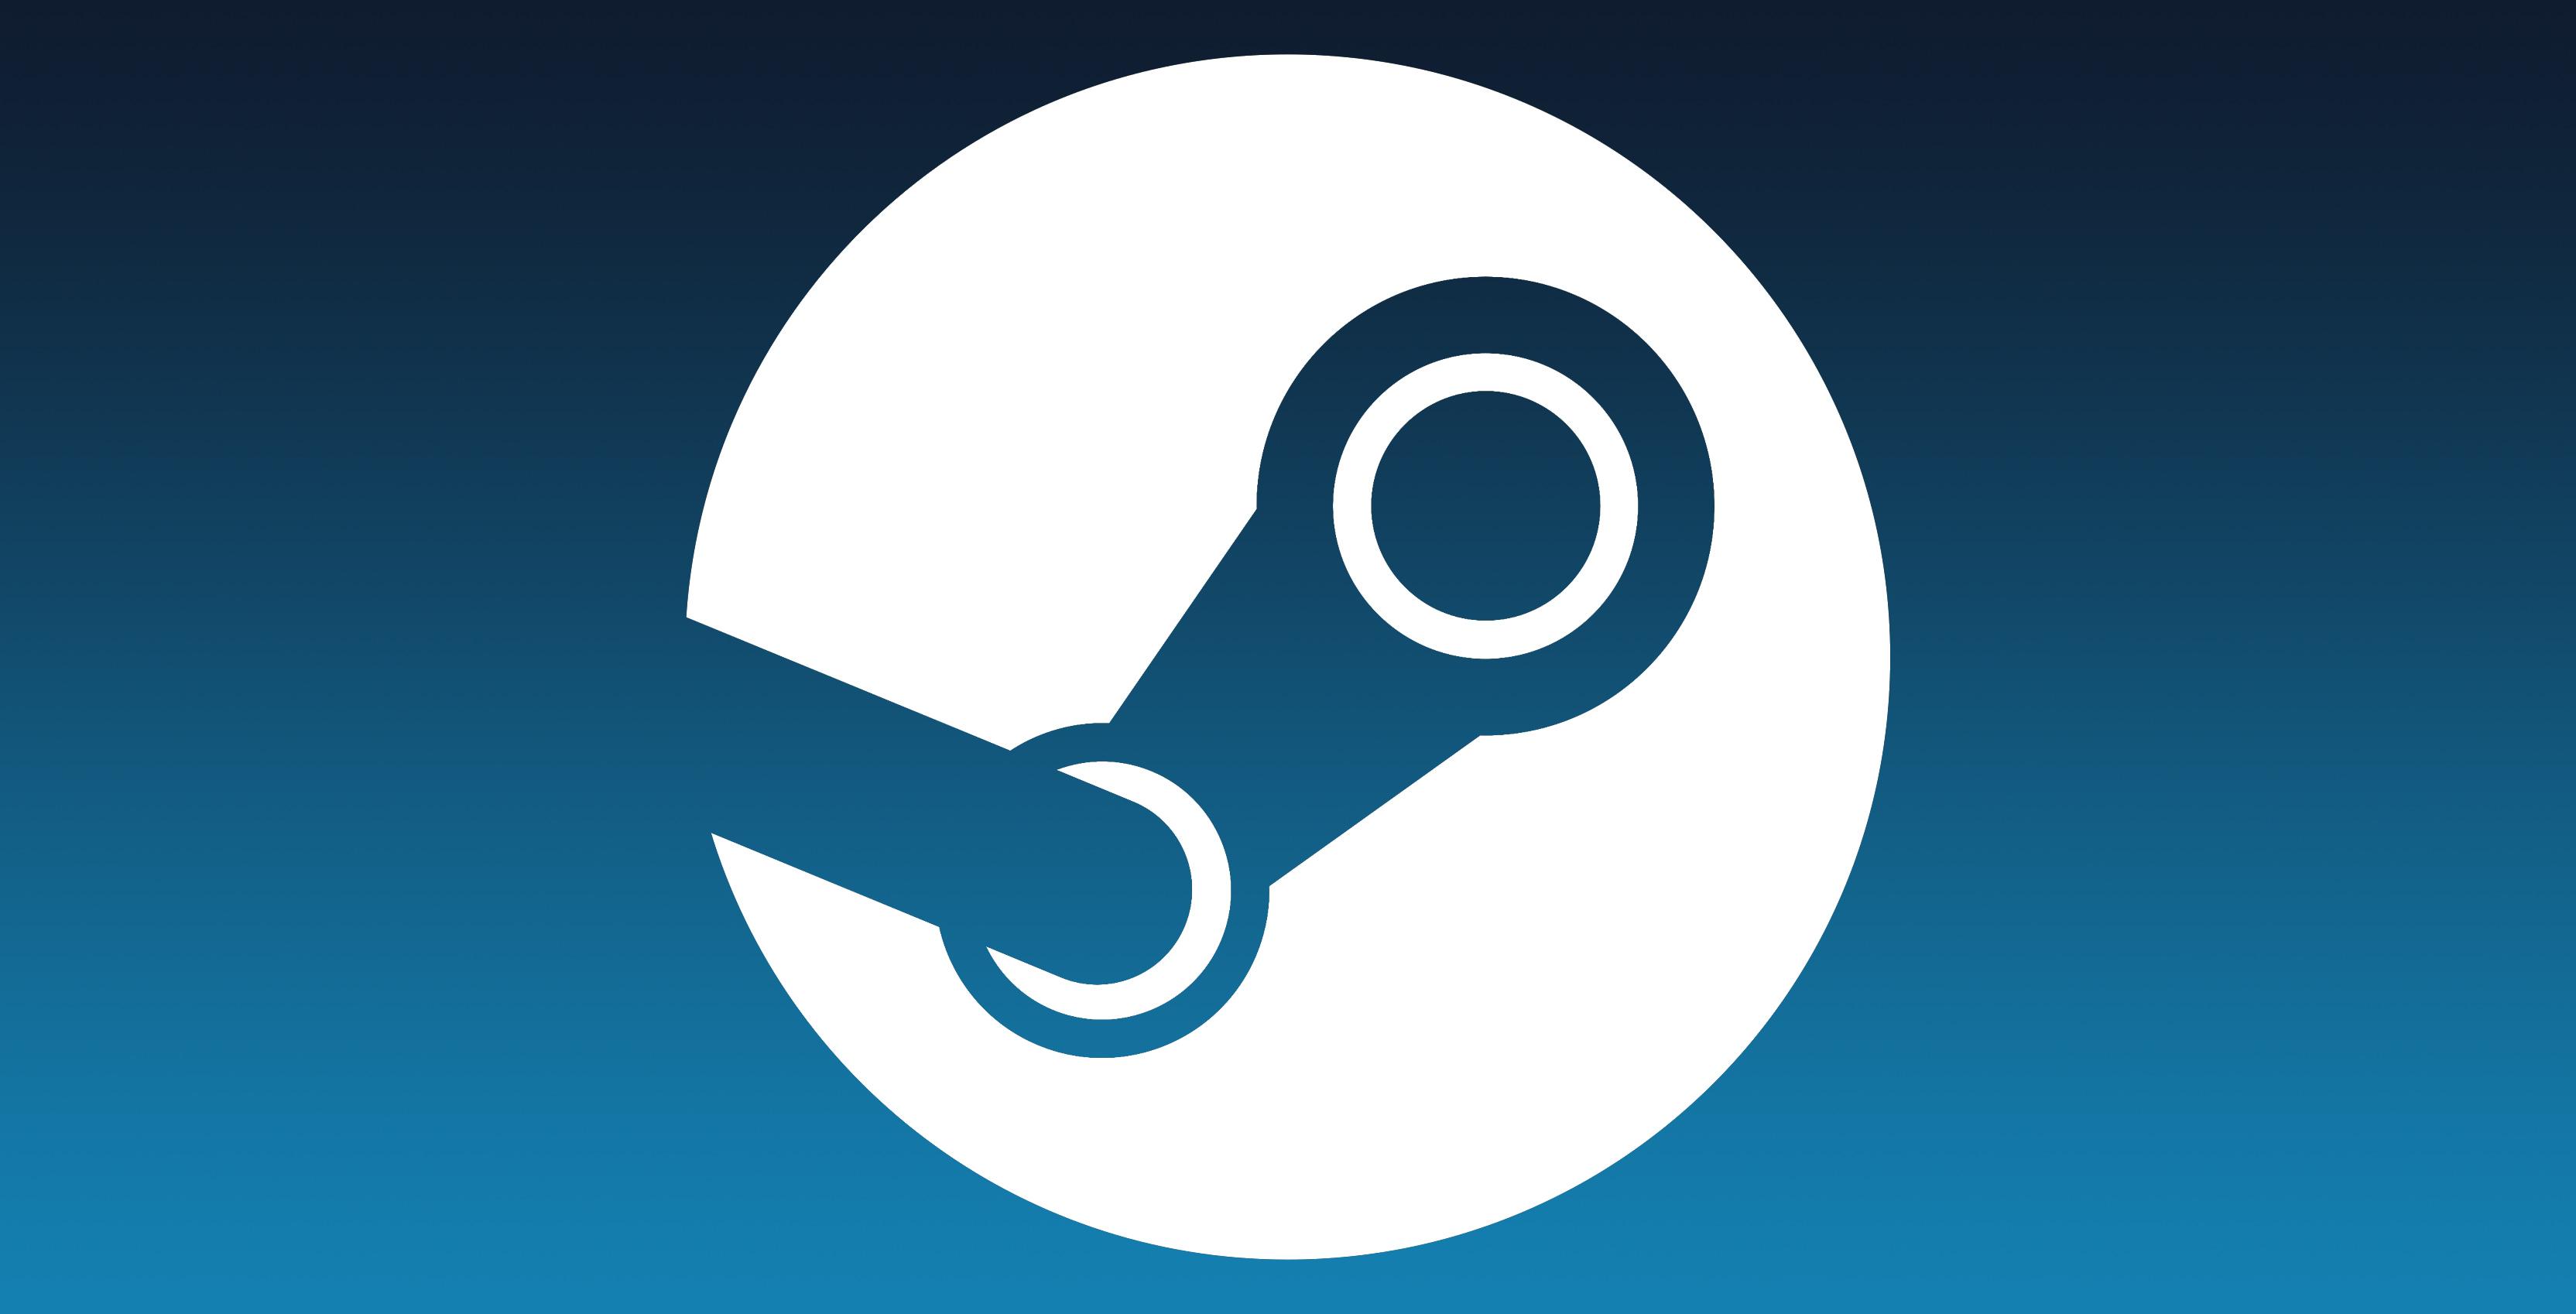 Steam libera modo multiplayer local para jogar online